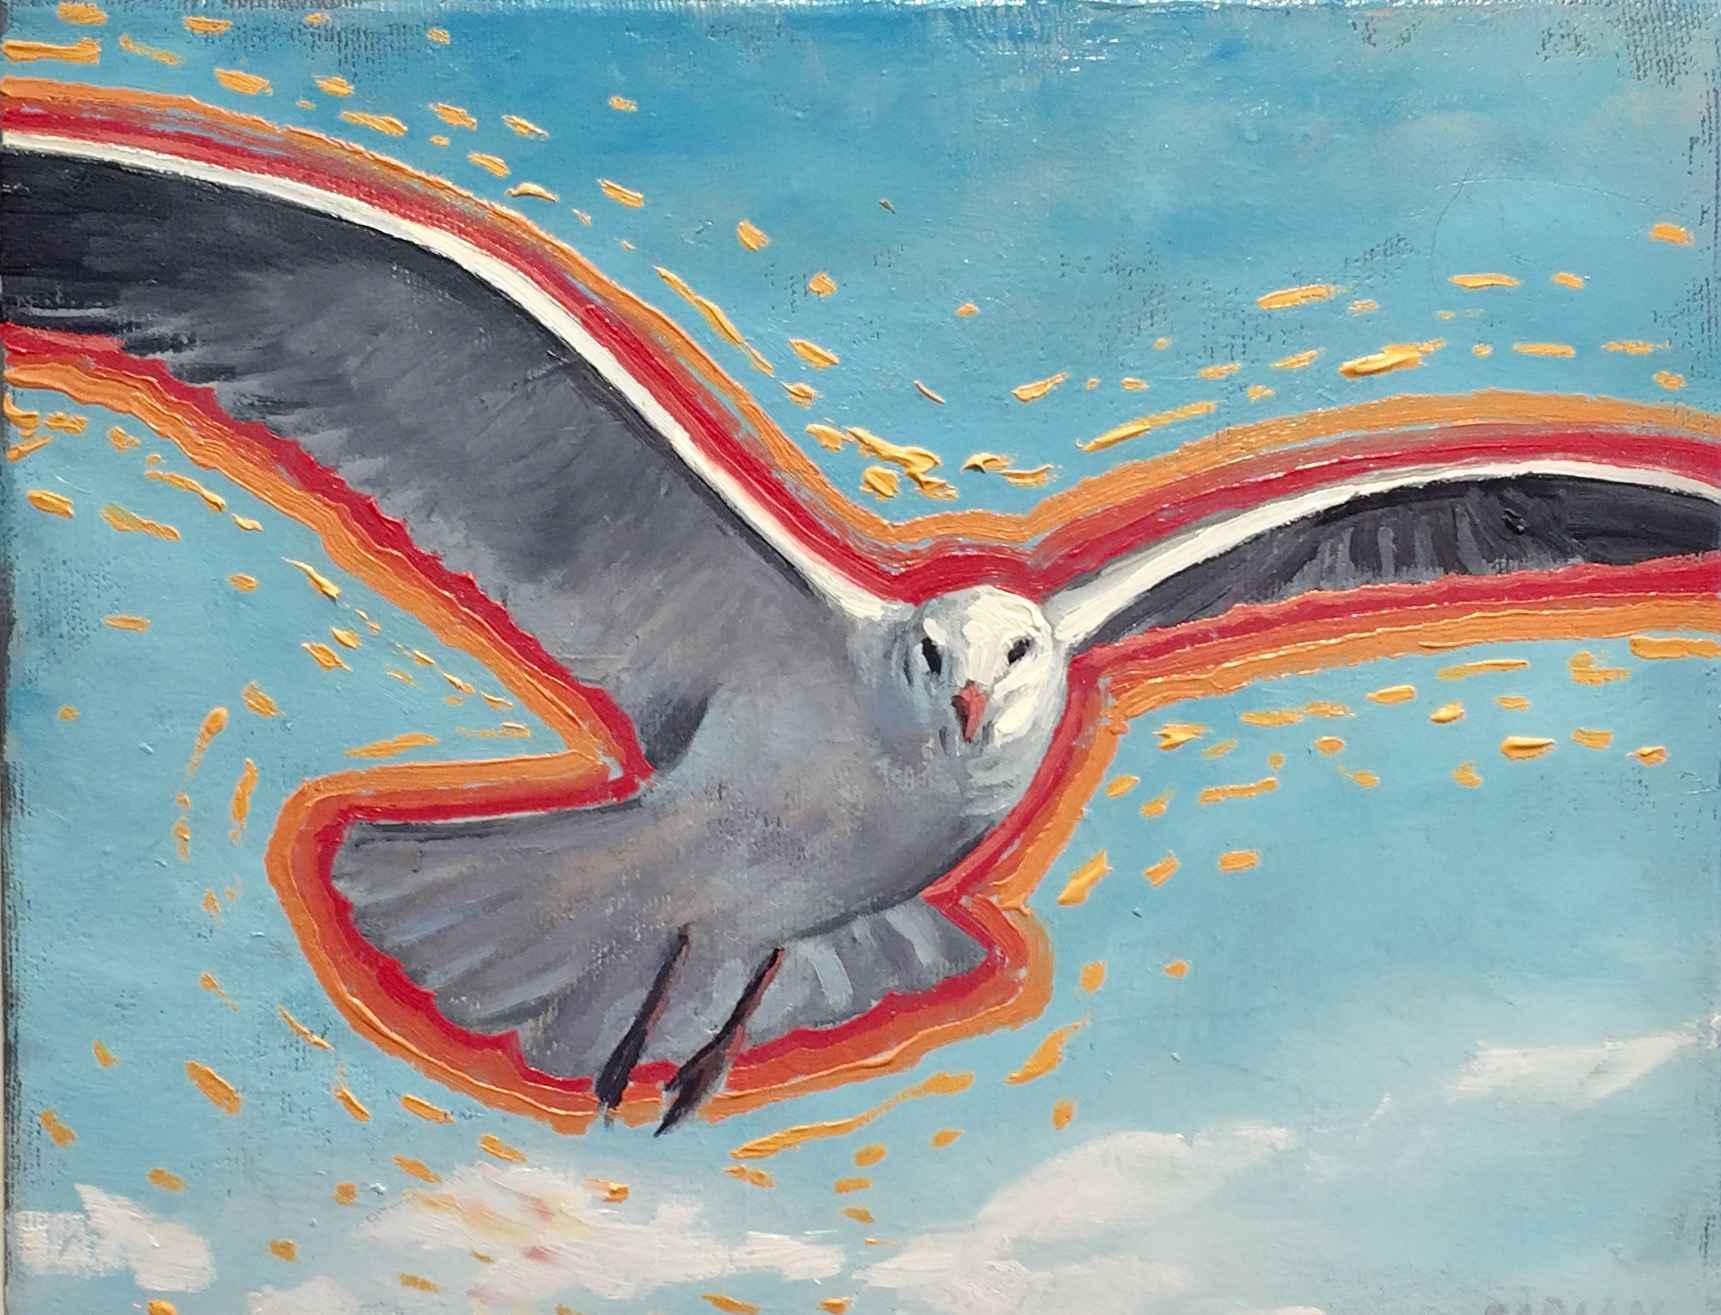 Animals Dreaming - Gu... by   Fabian - Masterpiece Online